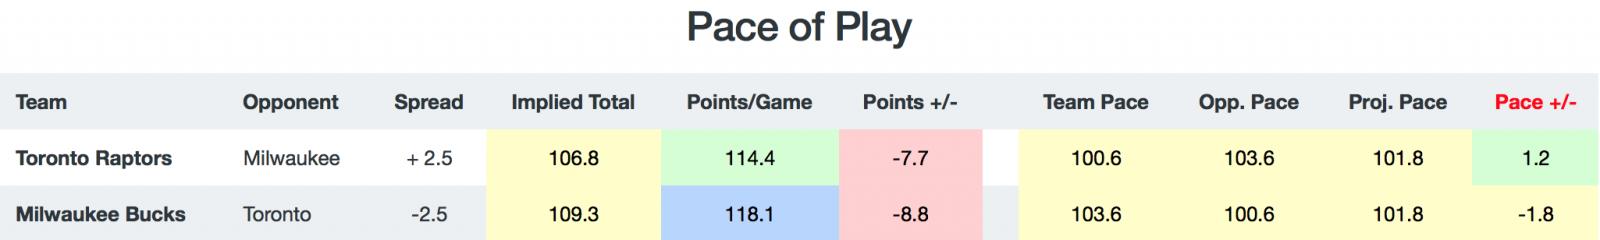 NBA Game Break Down - Pace